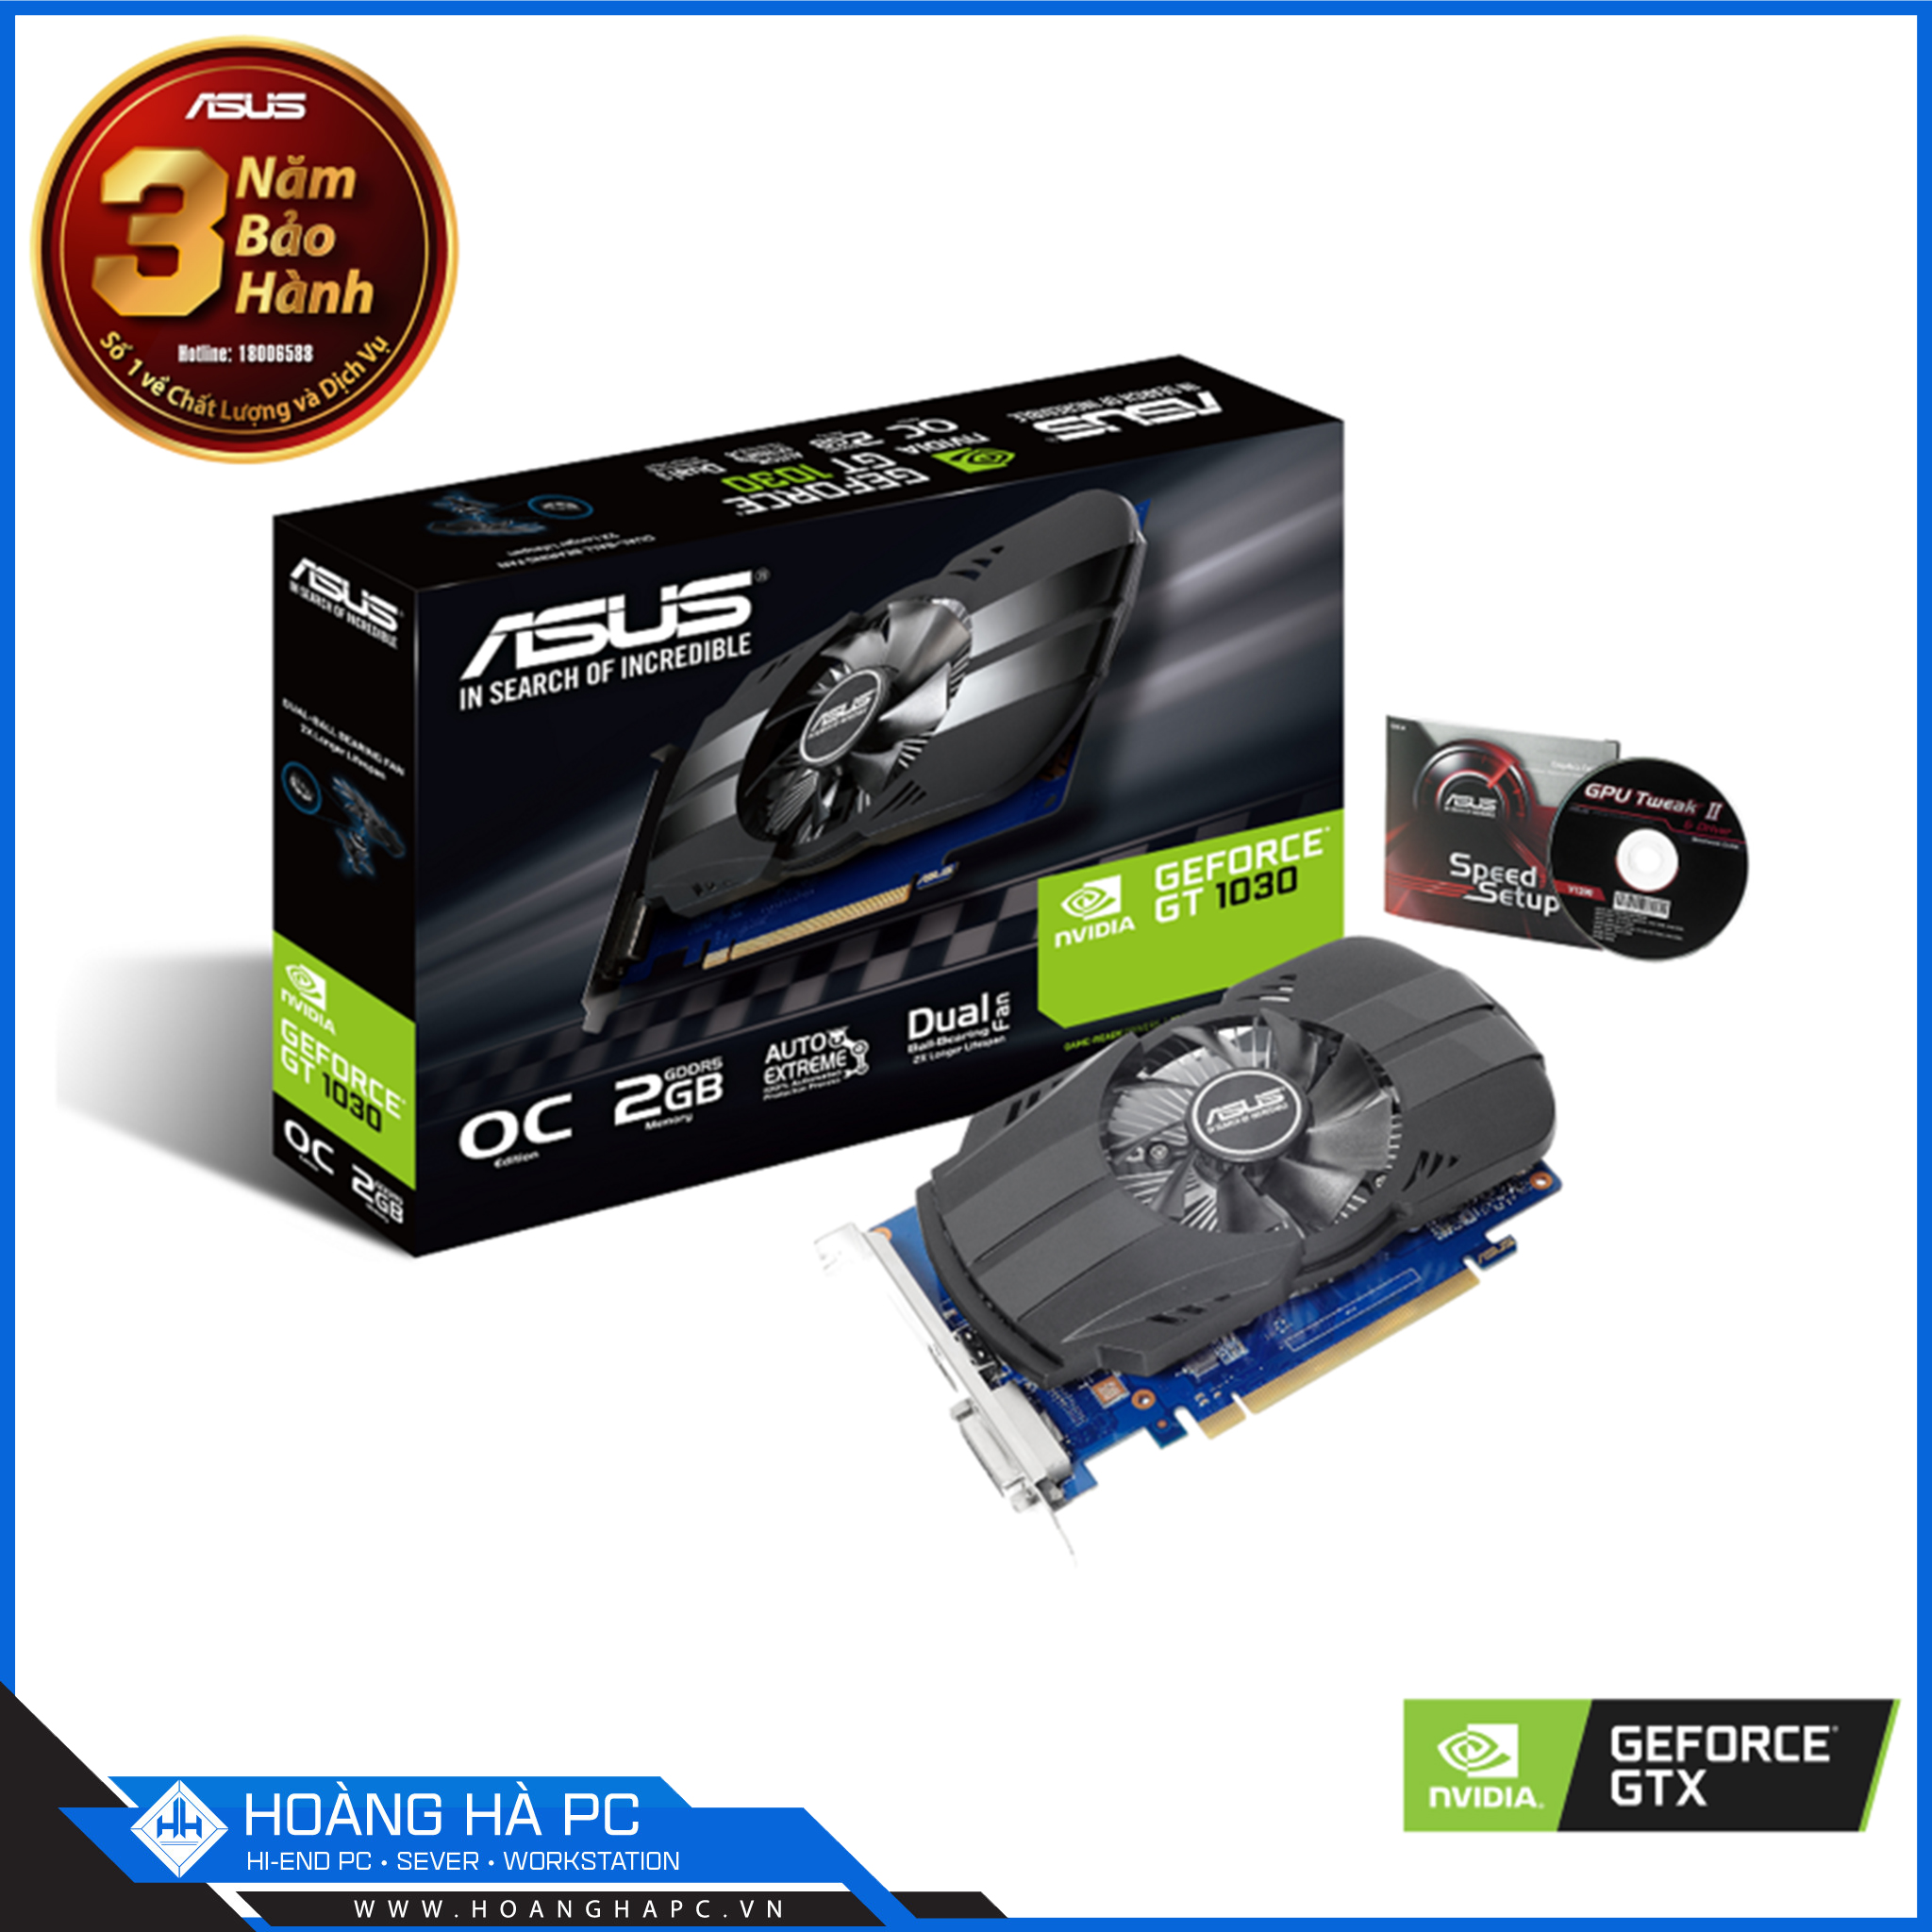 NVIDIA GEFORCE GT 1030 2GB GDDR5